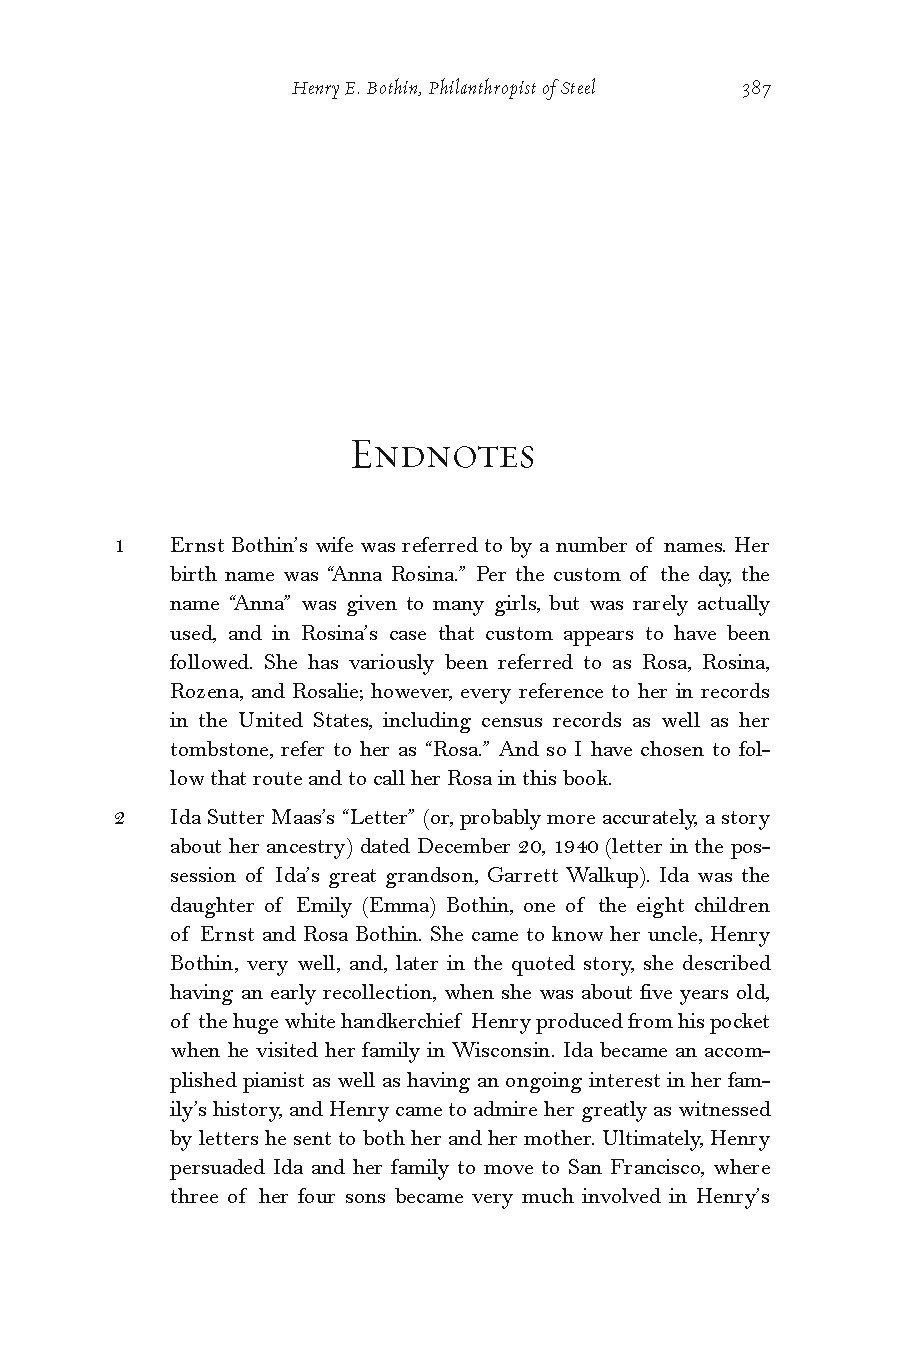 henry e. bothin_page_20.jpg